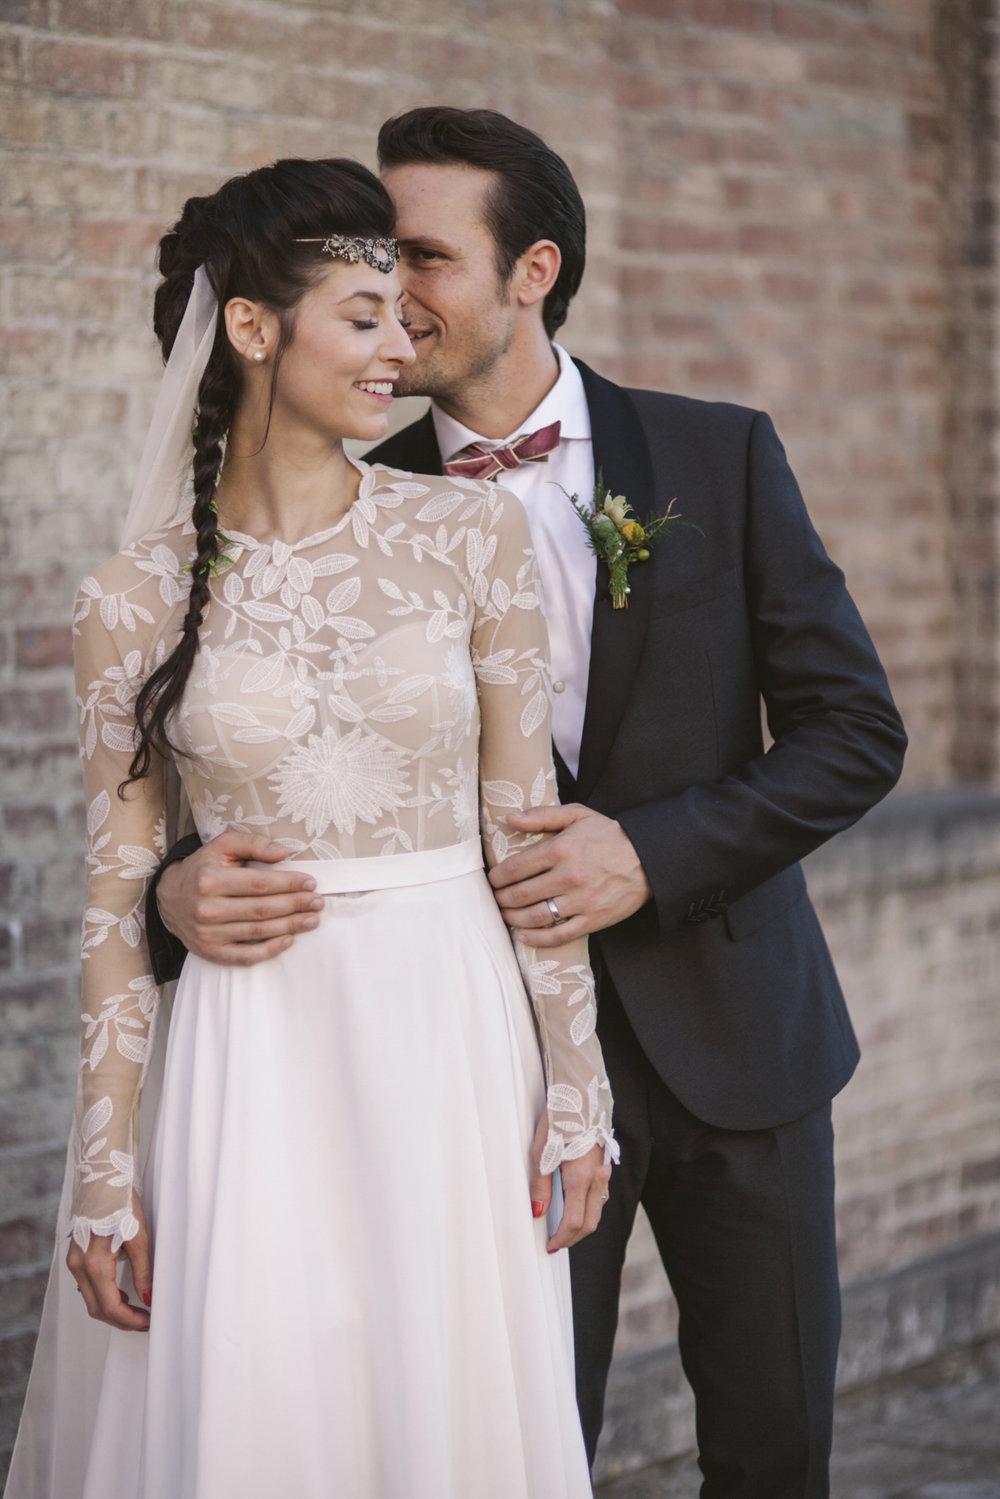 Kimberly-Coccagnia-Wedding-Photographer-147.JPG